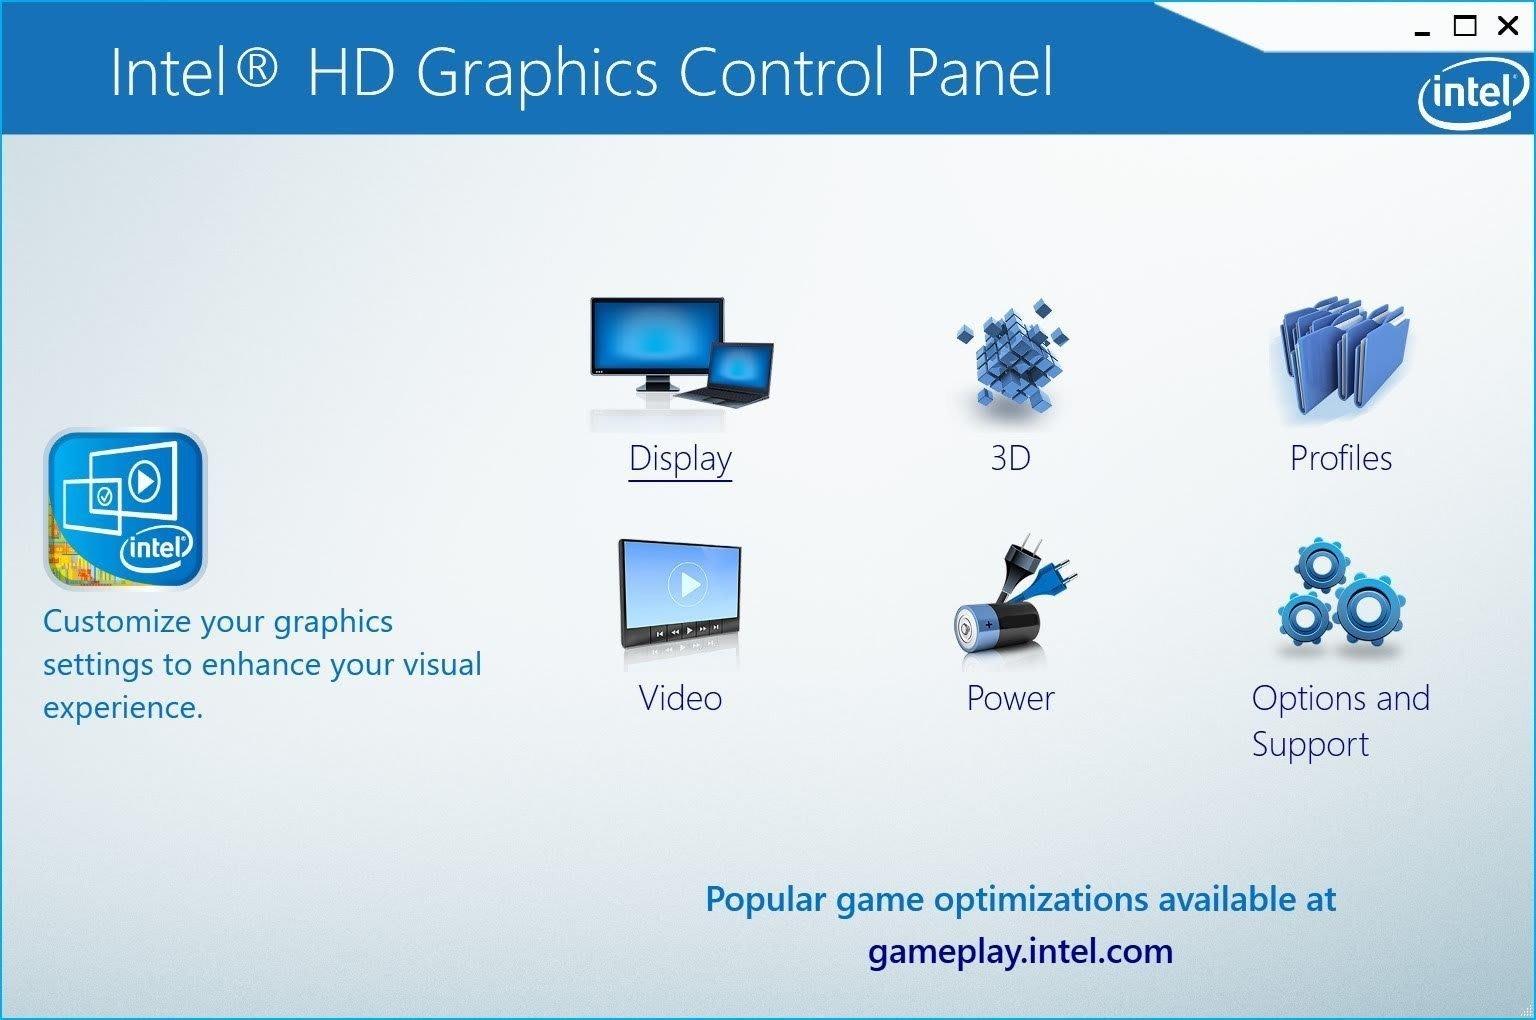 Intel HFGraphics Control Panel